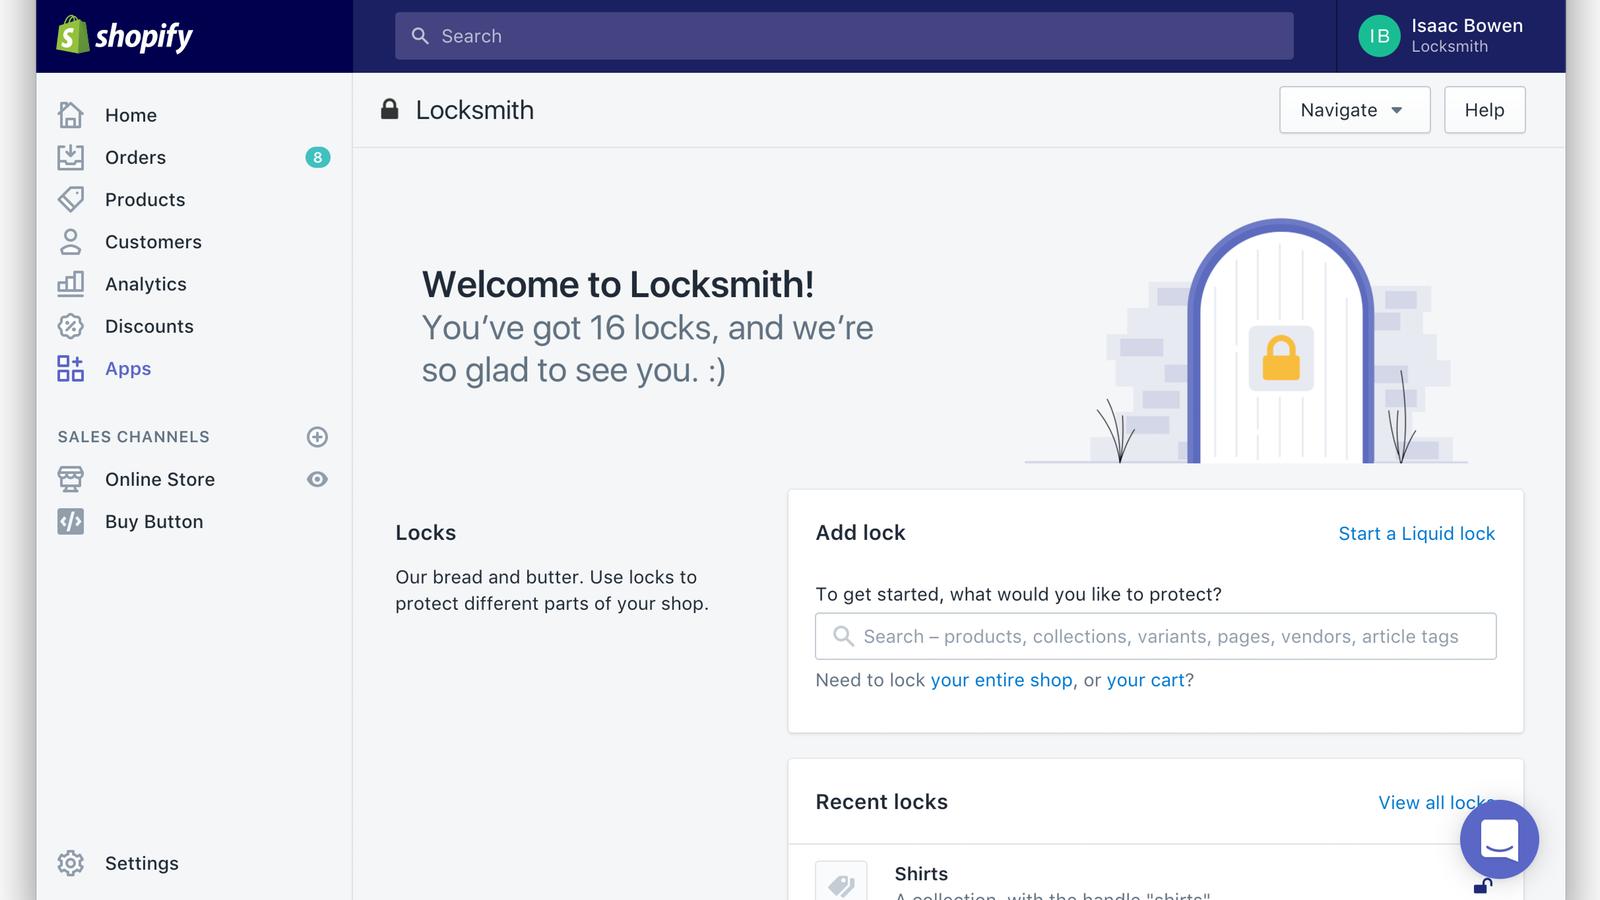 Locksmith homepage